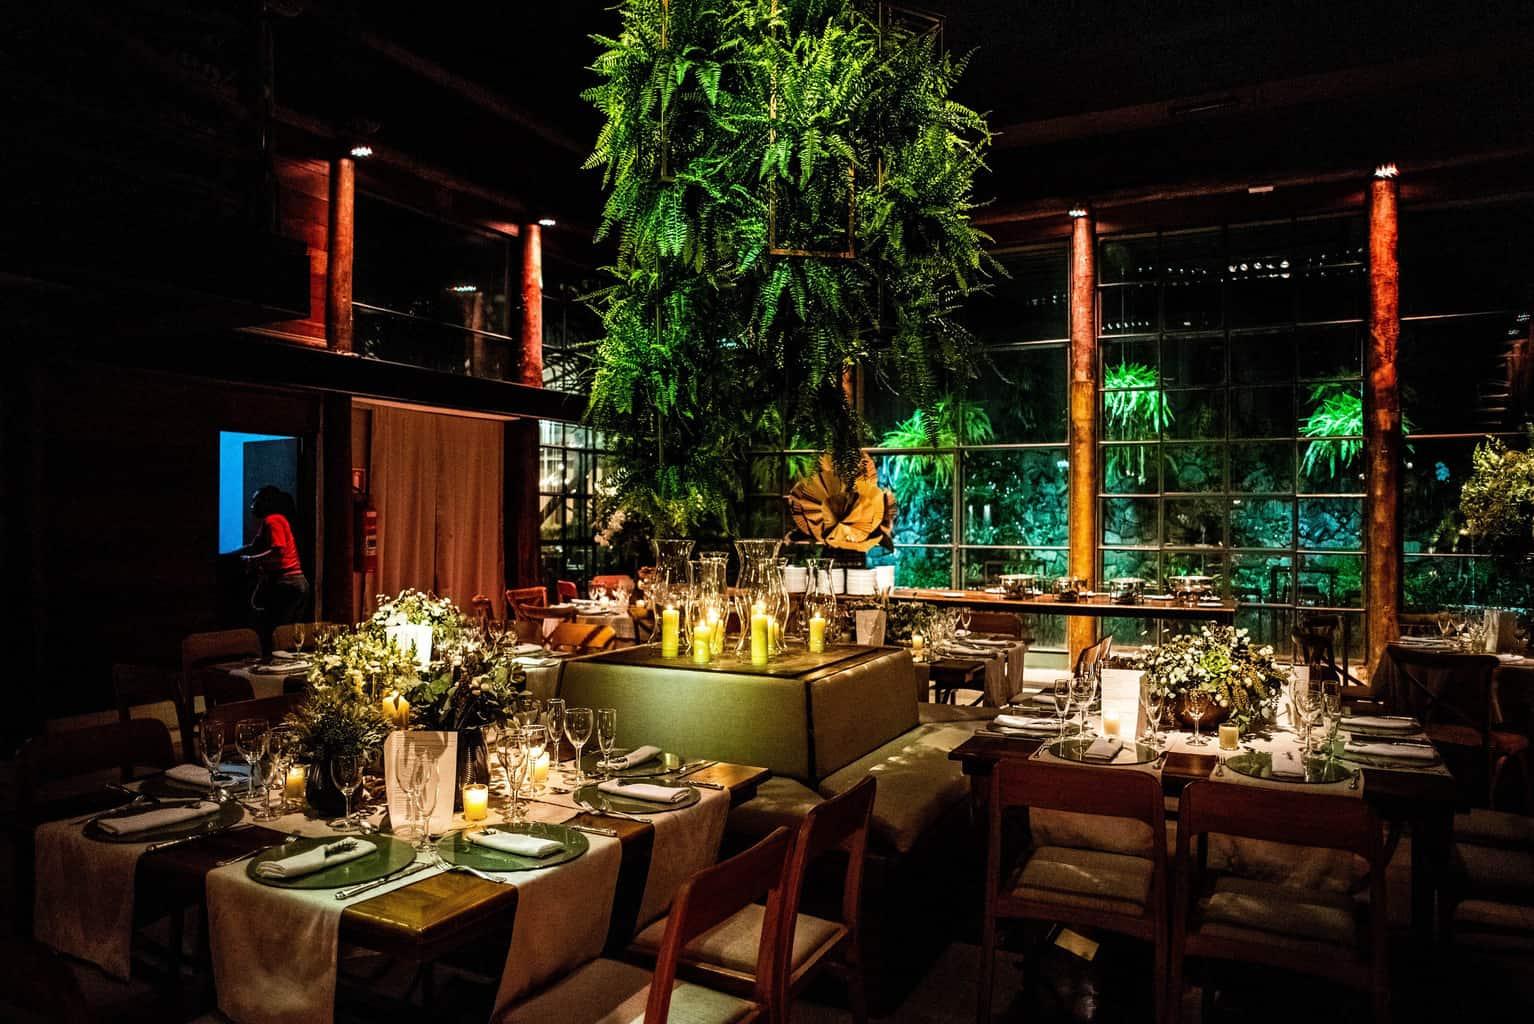 Bel-Benkler-eventos-Casamento-Ariane-e-Matheus-cerimonia-decoracao-contemporanea-fotografia-Rafael-Bigarelli-noivos-na-pista-Spazio-Giardini-3